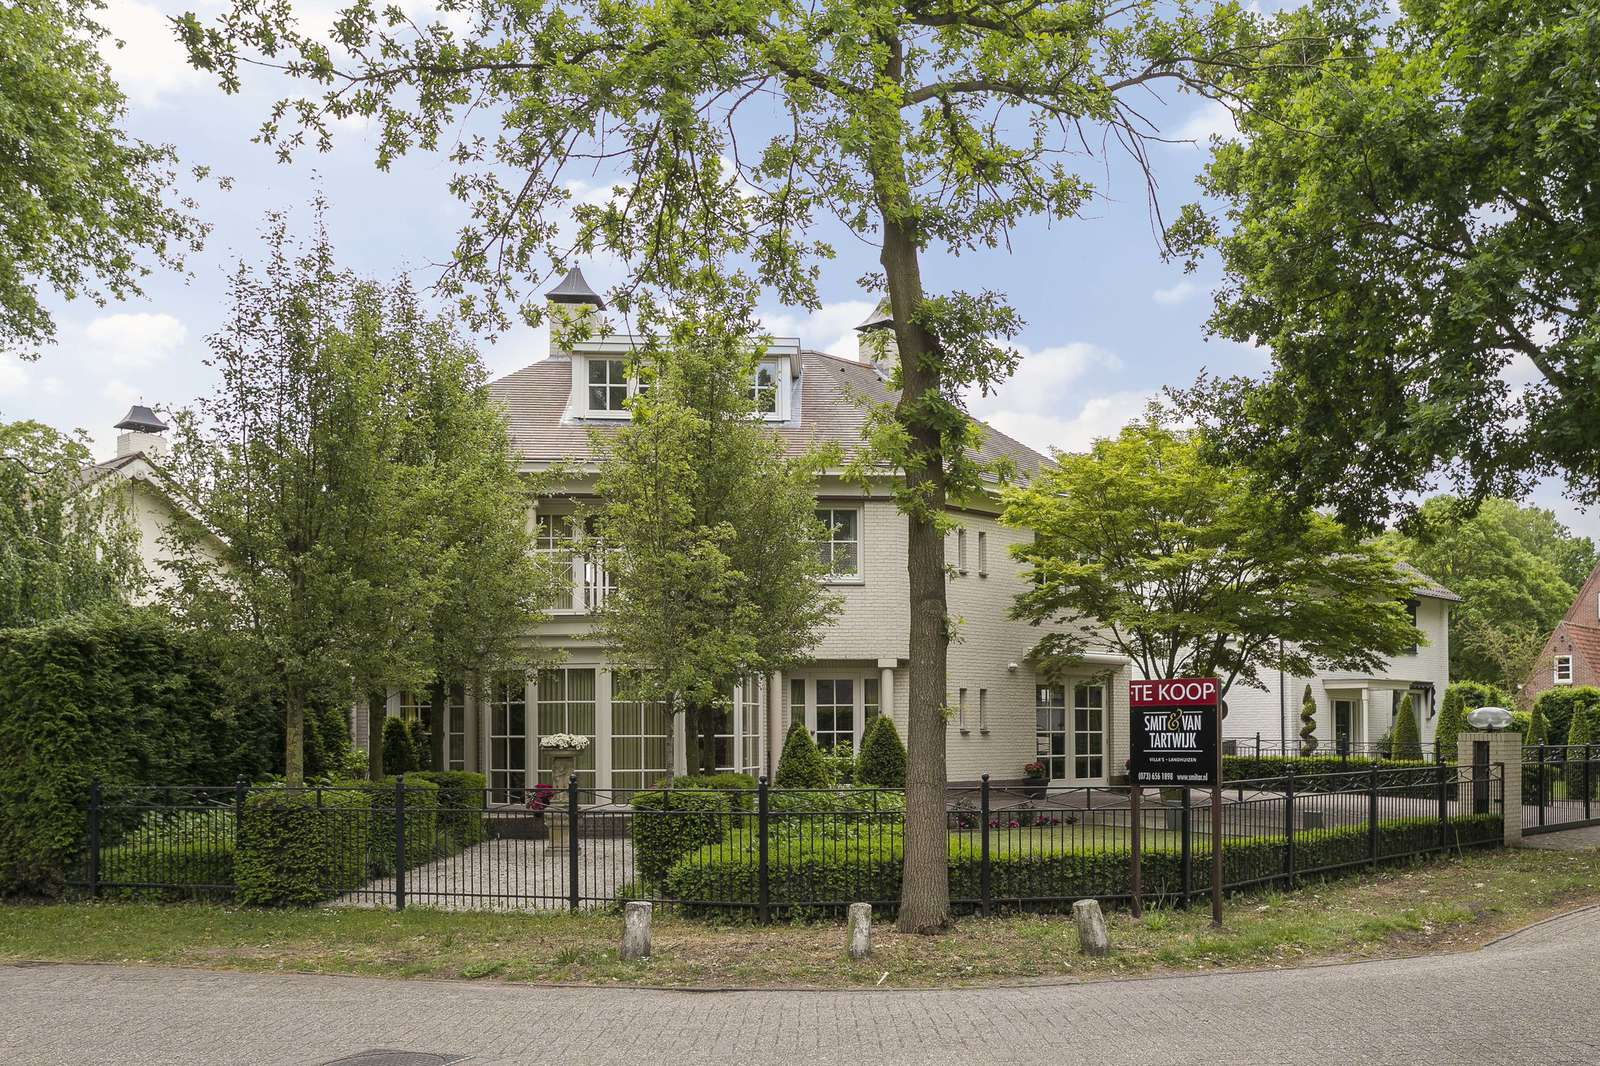 Bleijendaalseweg 6, villa Berlicum